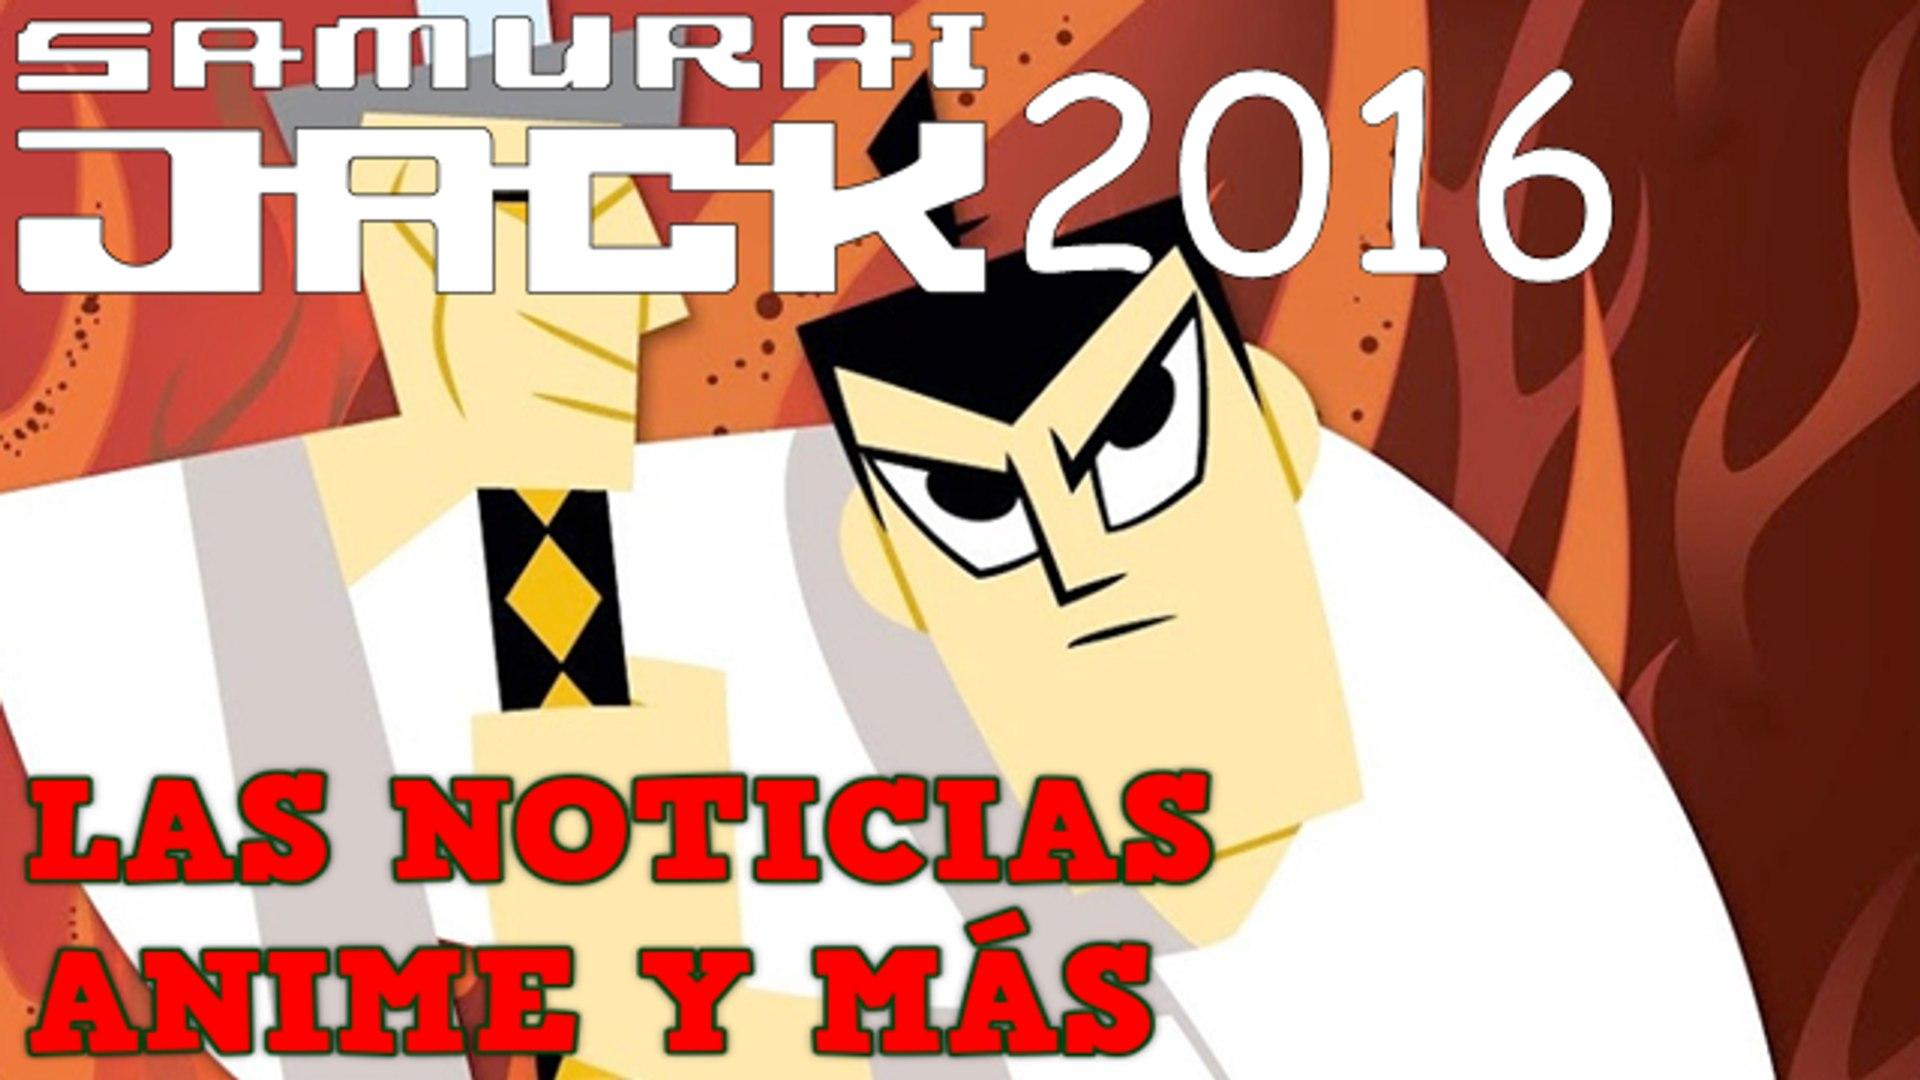 NOTICIAS Anime: Samurai Jack 2016, Tokyo Ghoul Pelicula Live Action, Kochikame Haikyuu!! y más